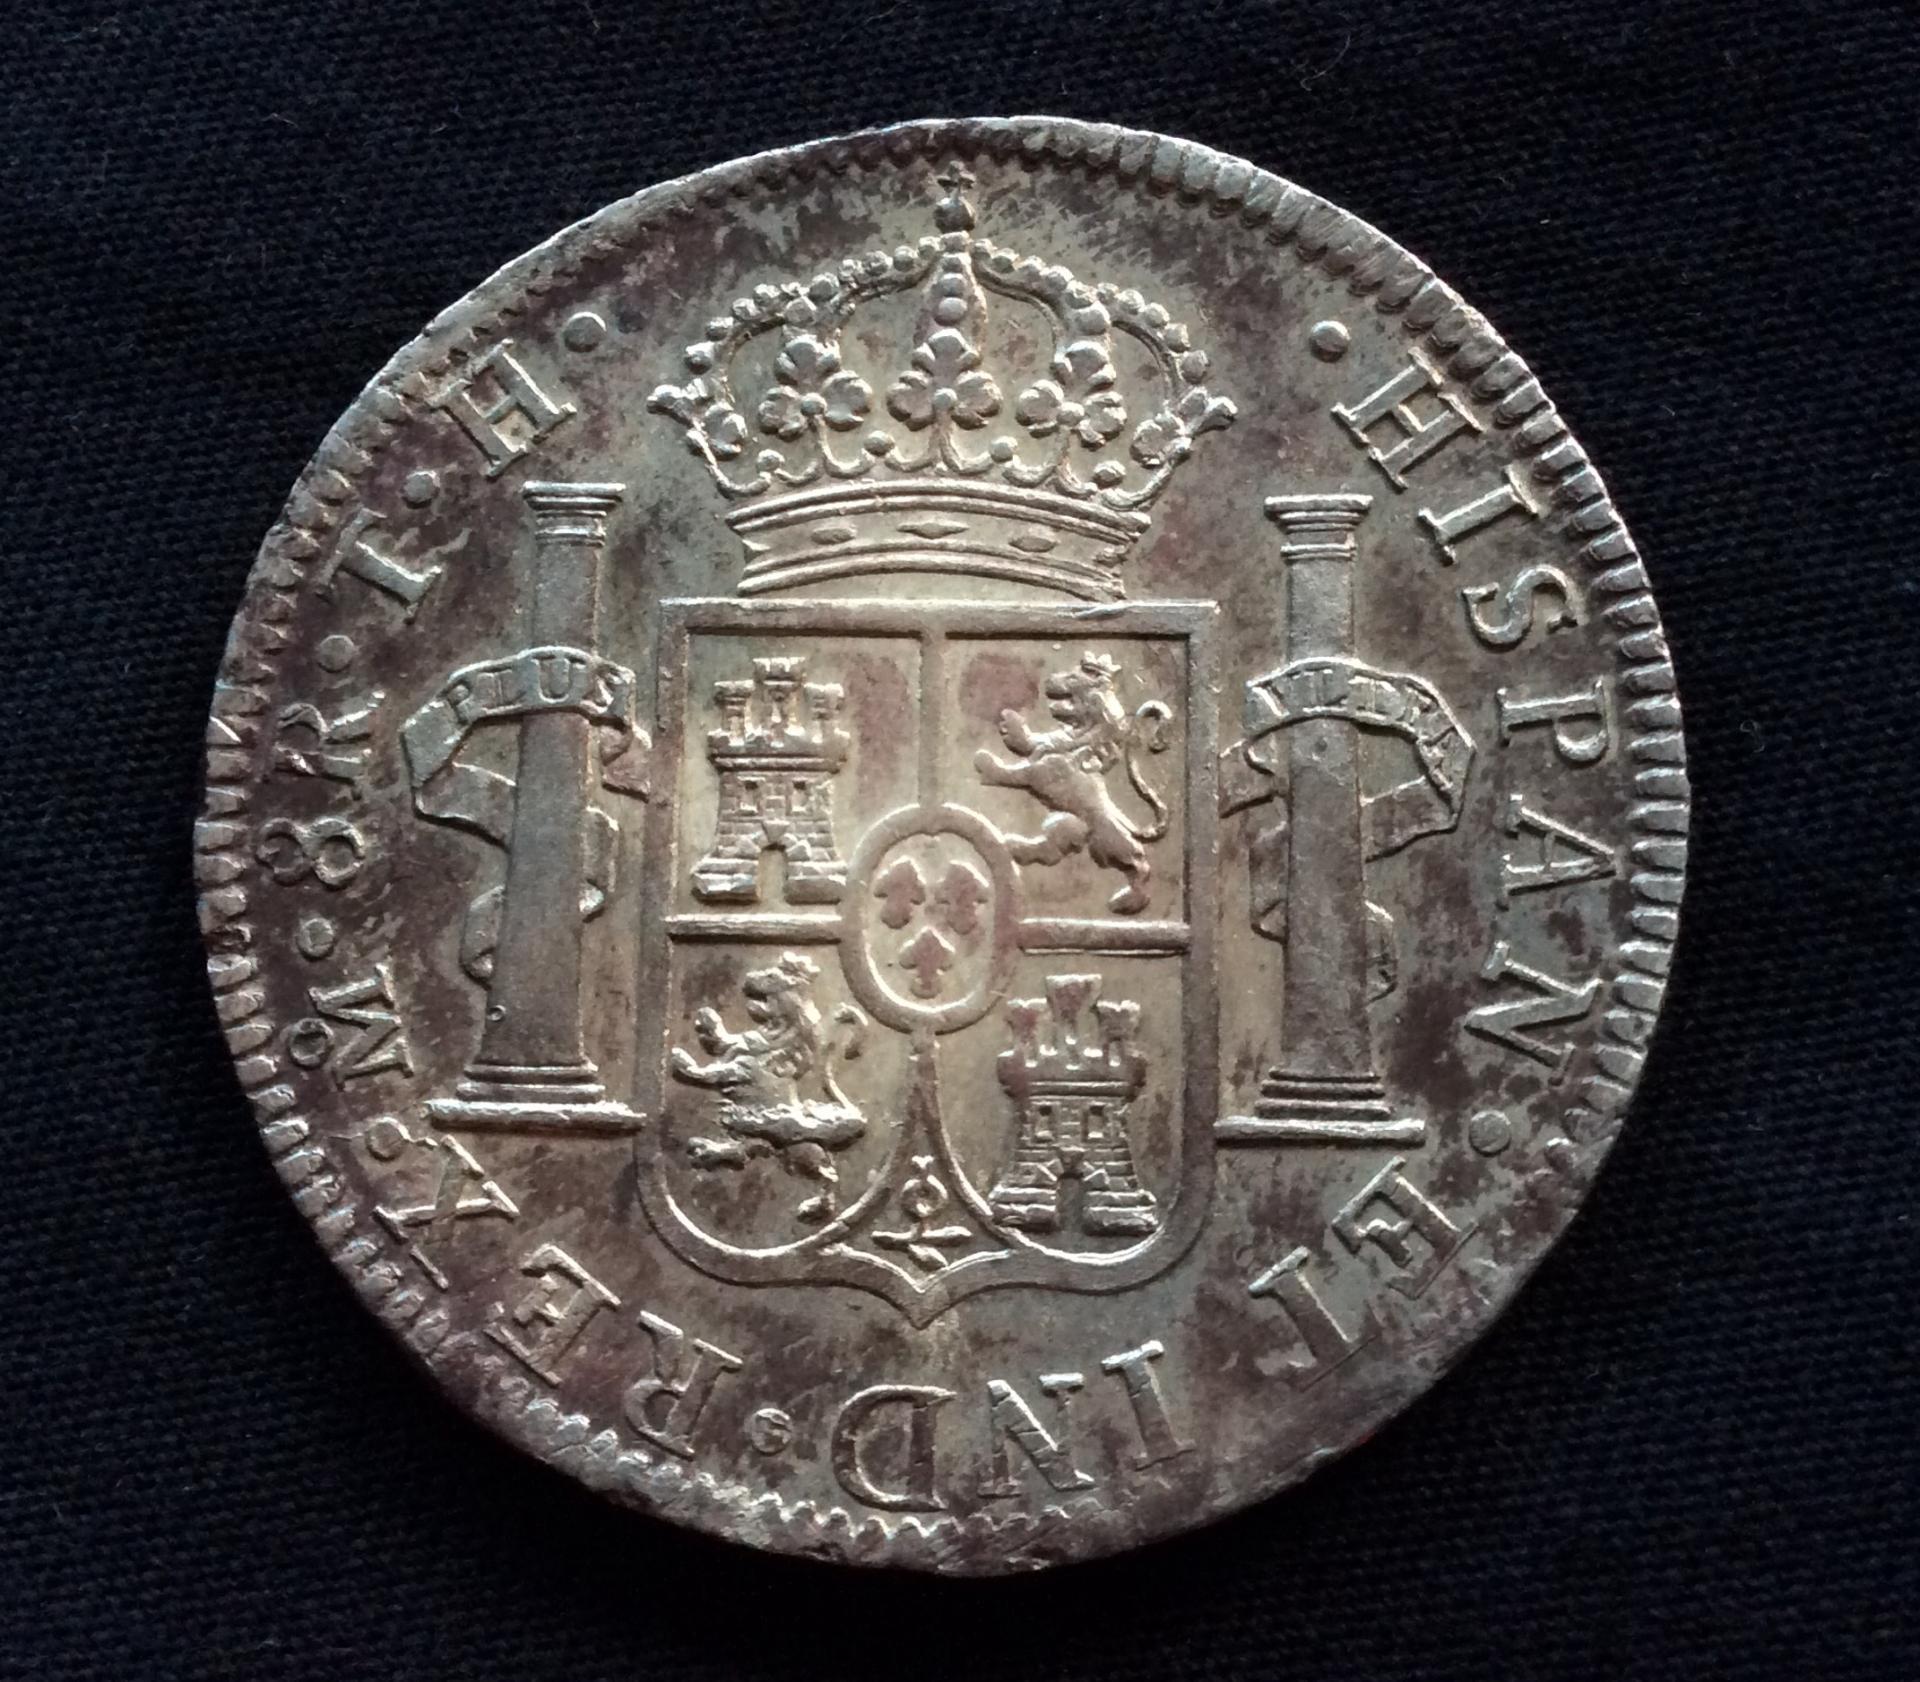 8 REALES PLATA 1805 - CARLOS IV - MEXICO